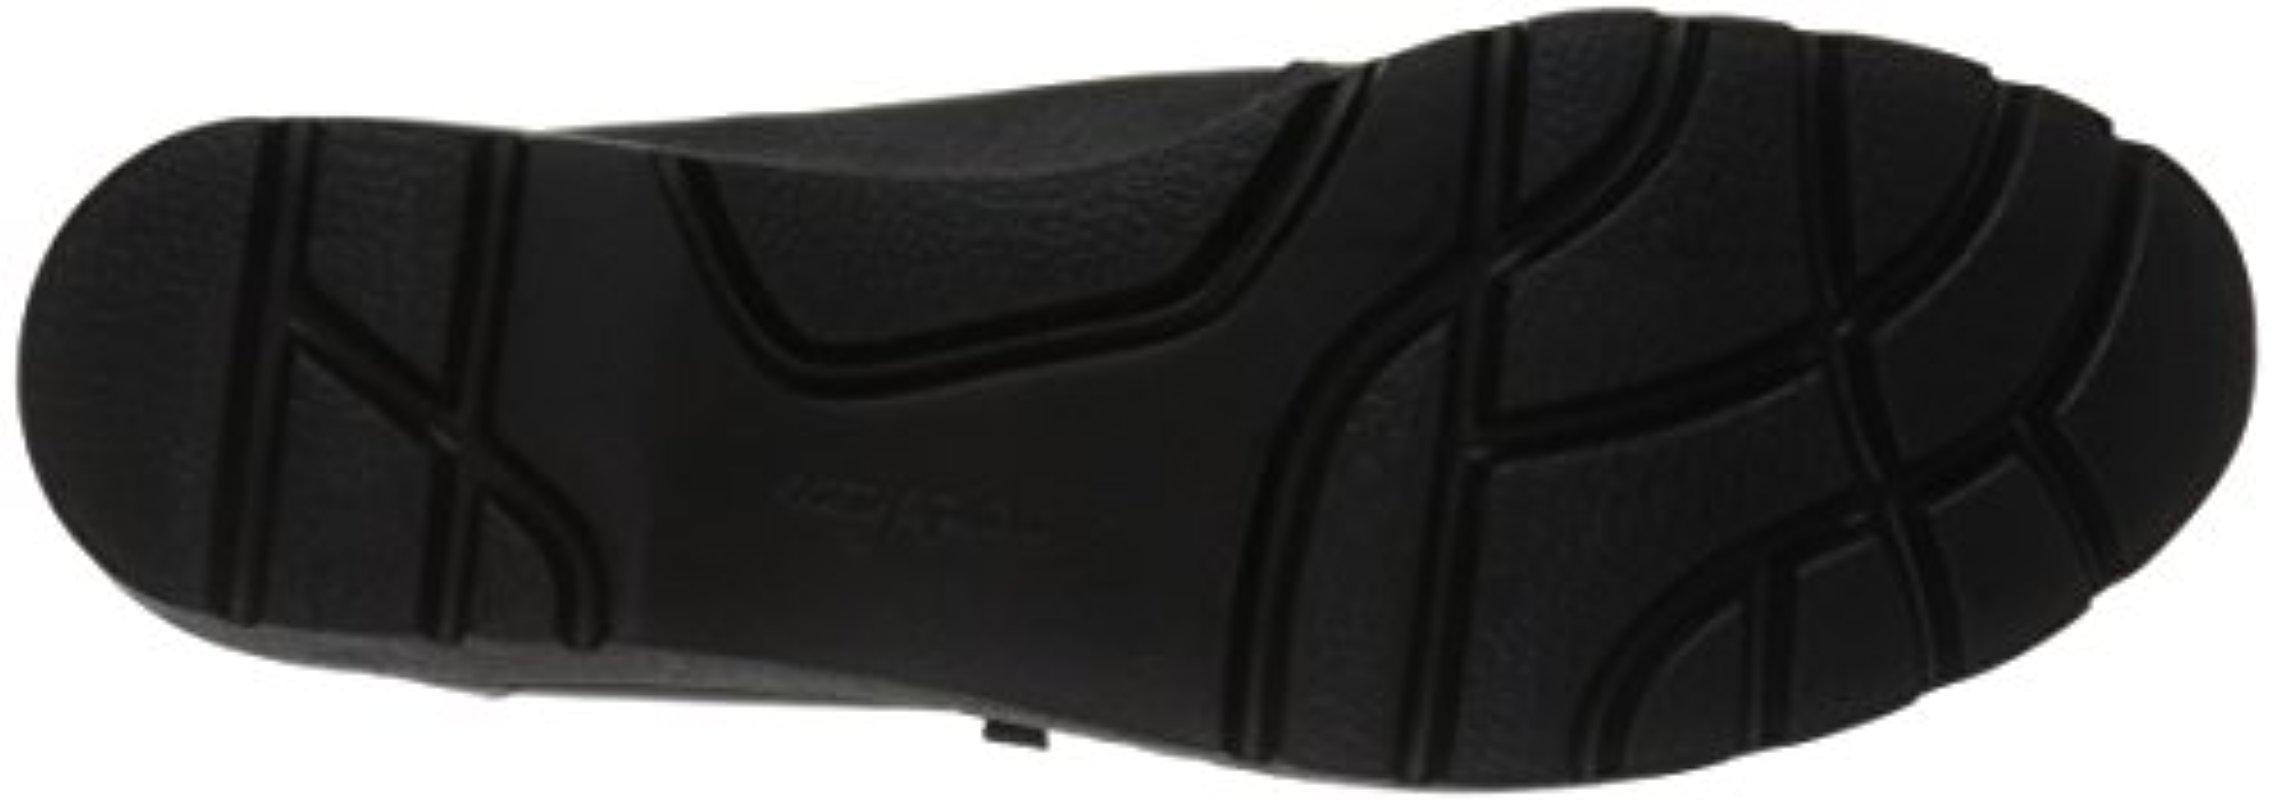 118a0a81f9ffc Lyst - Easy Spirit Oakhill Slip-on Loafer